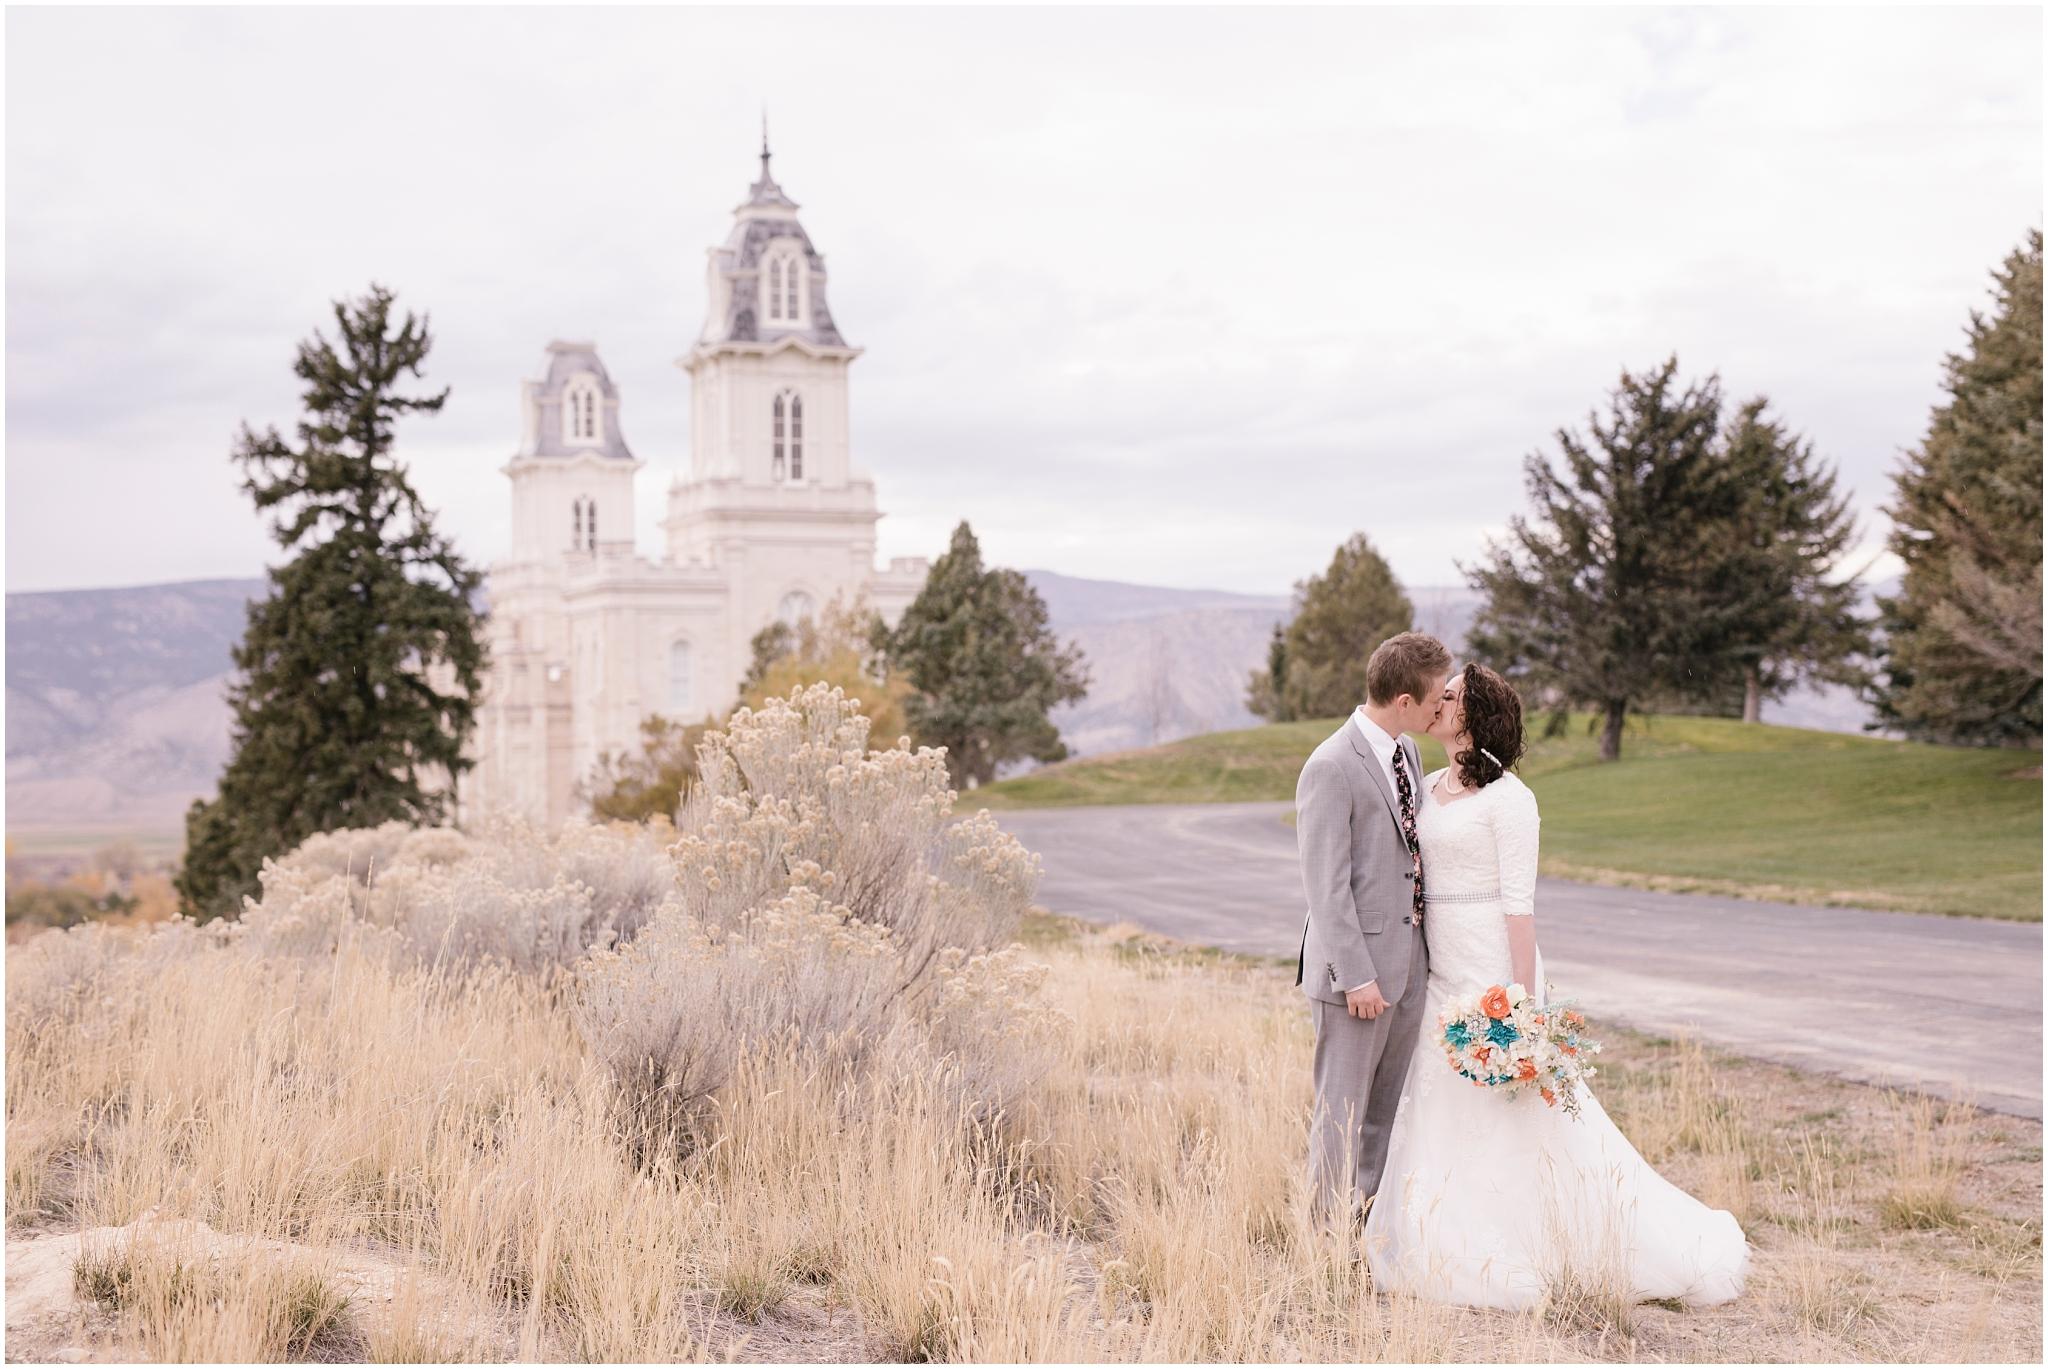 BA-Bridals-56_Lizzie-B-Imagery-Utah-Wedding-Photographer-Central-Utah-Photographer-Utah-County-Manti-Utah-Temple.jpg